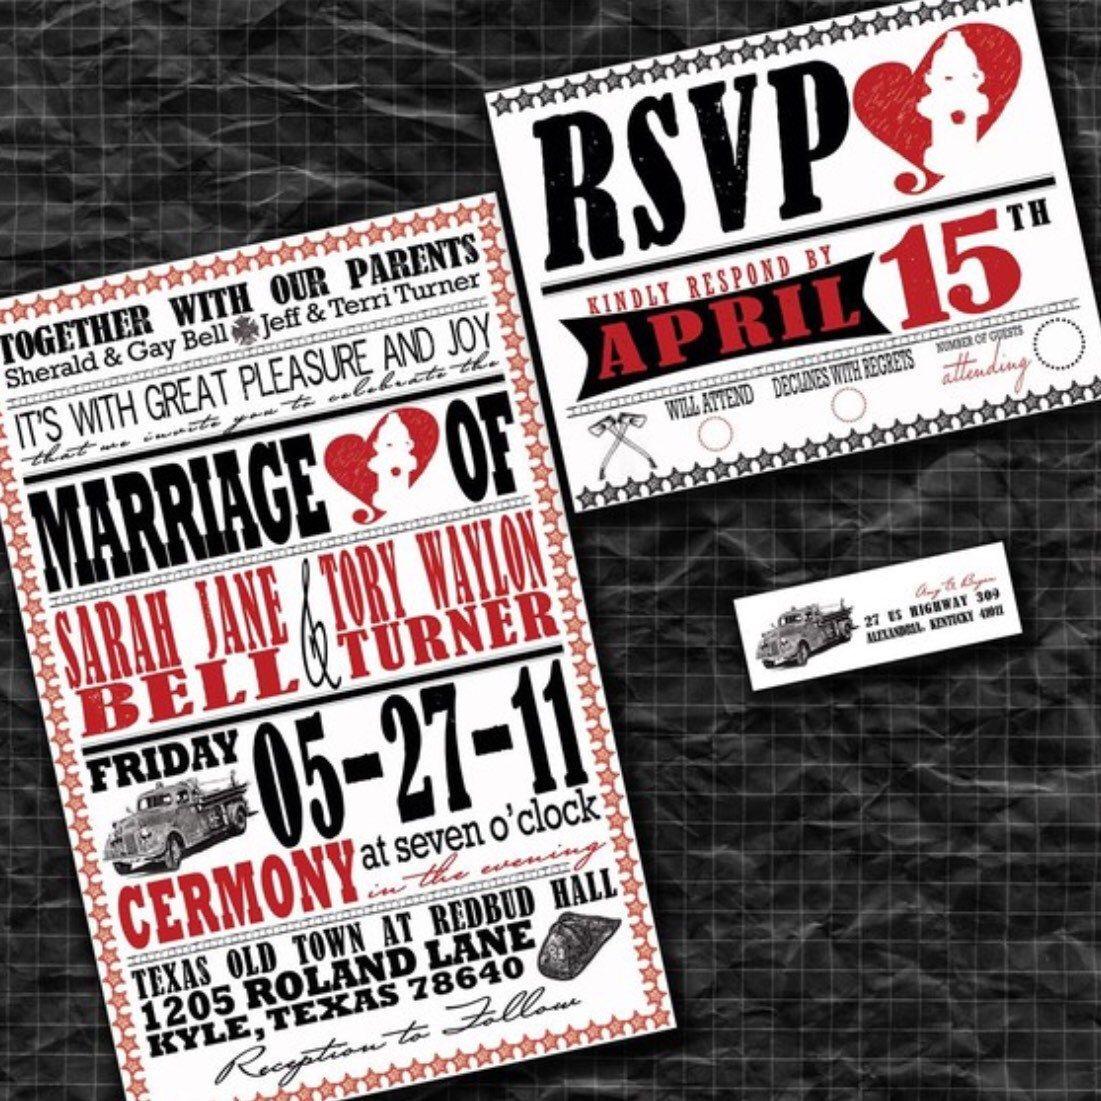 Firefighter Wedding Invitations | Fireman Wedding Invite Set ...